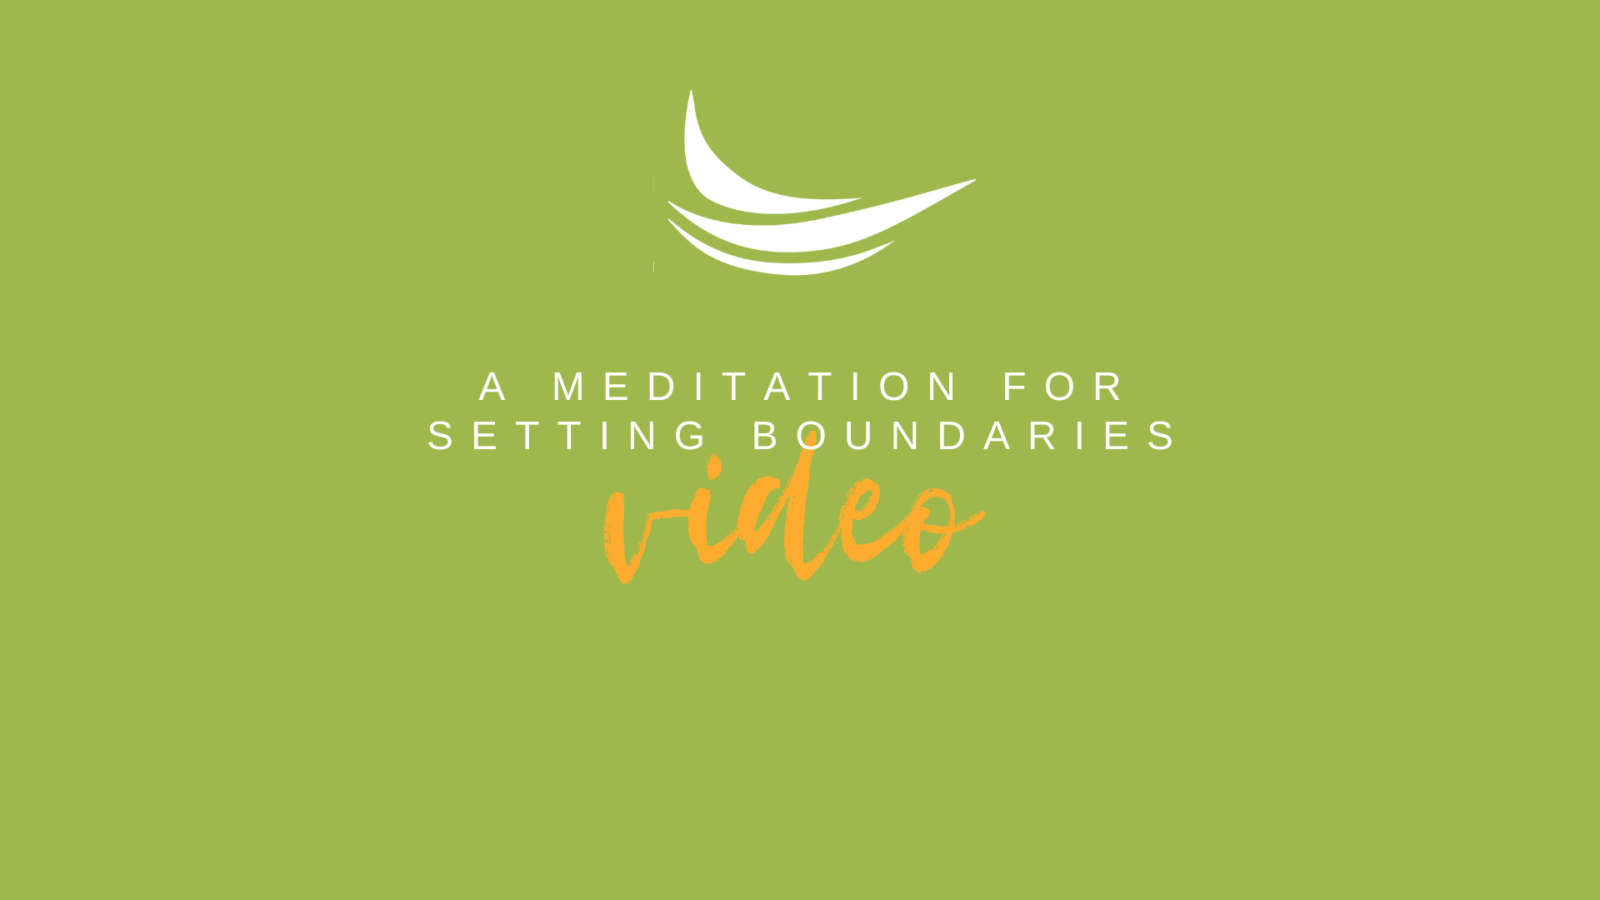 A Meditation for Setting Boundaries